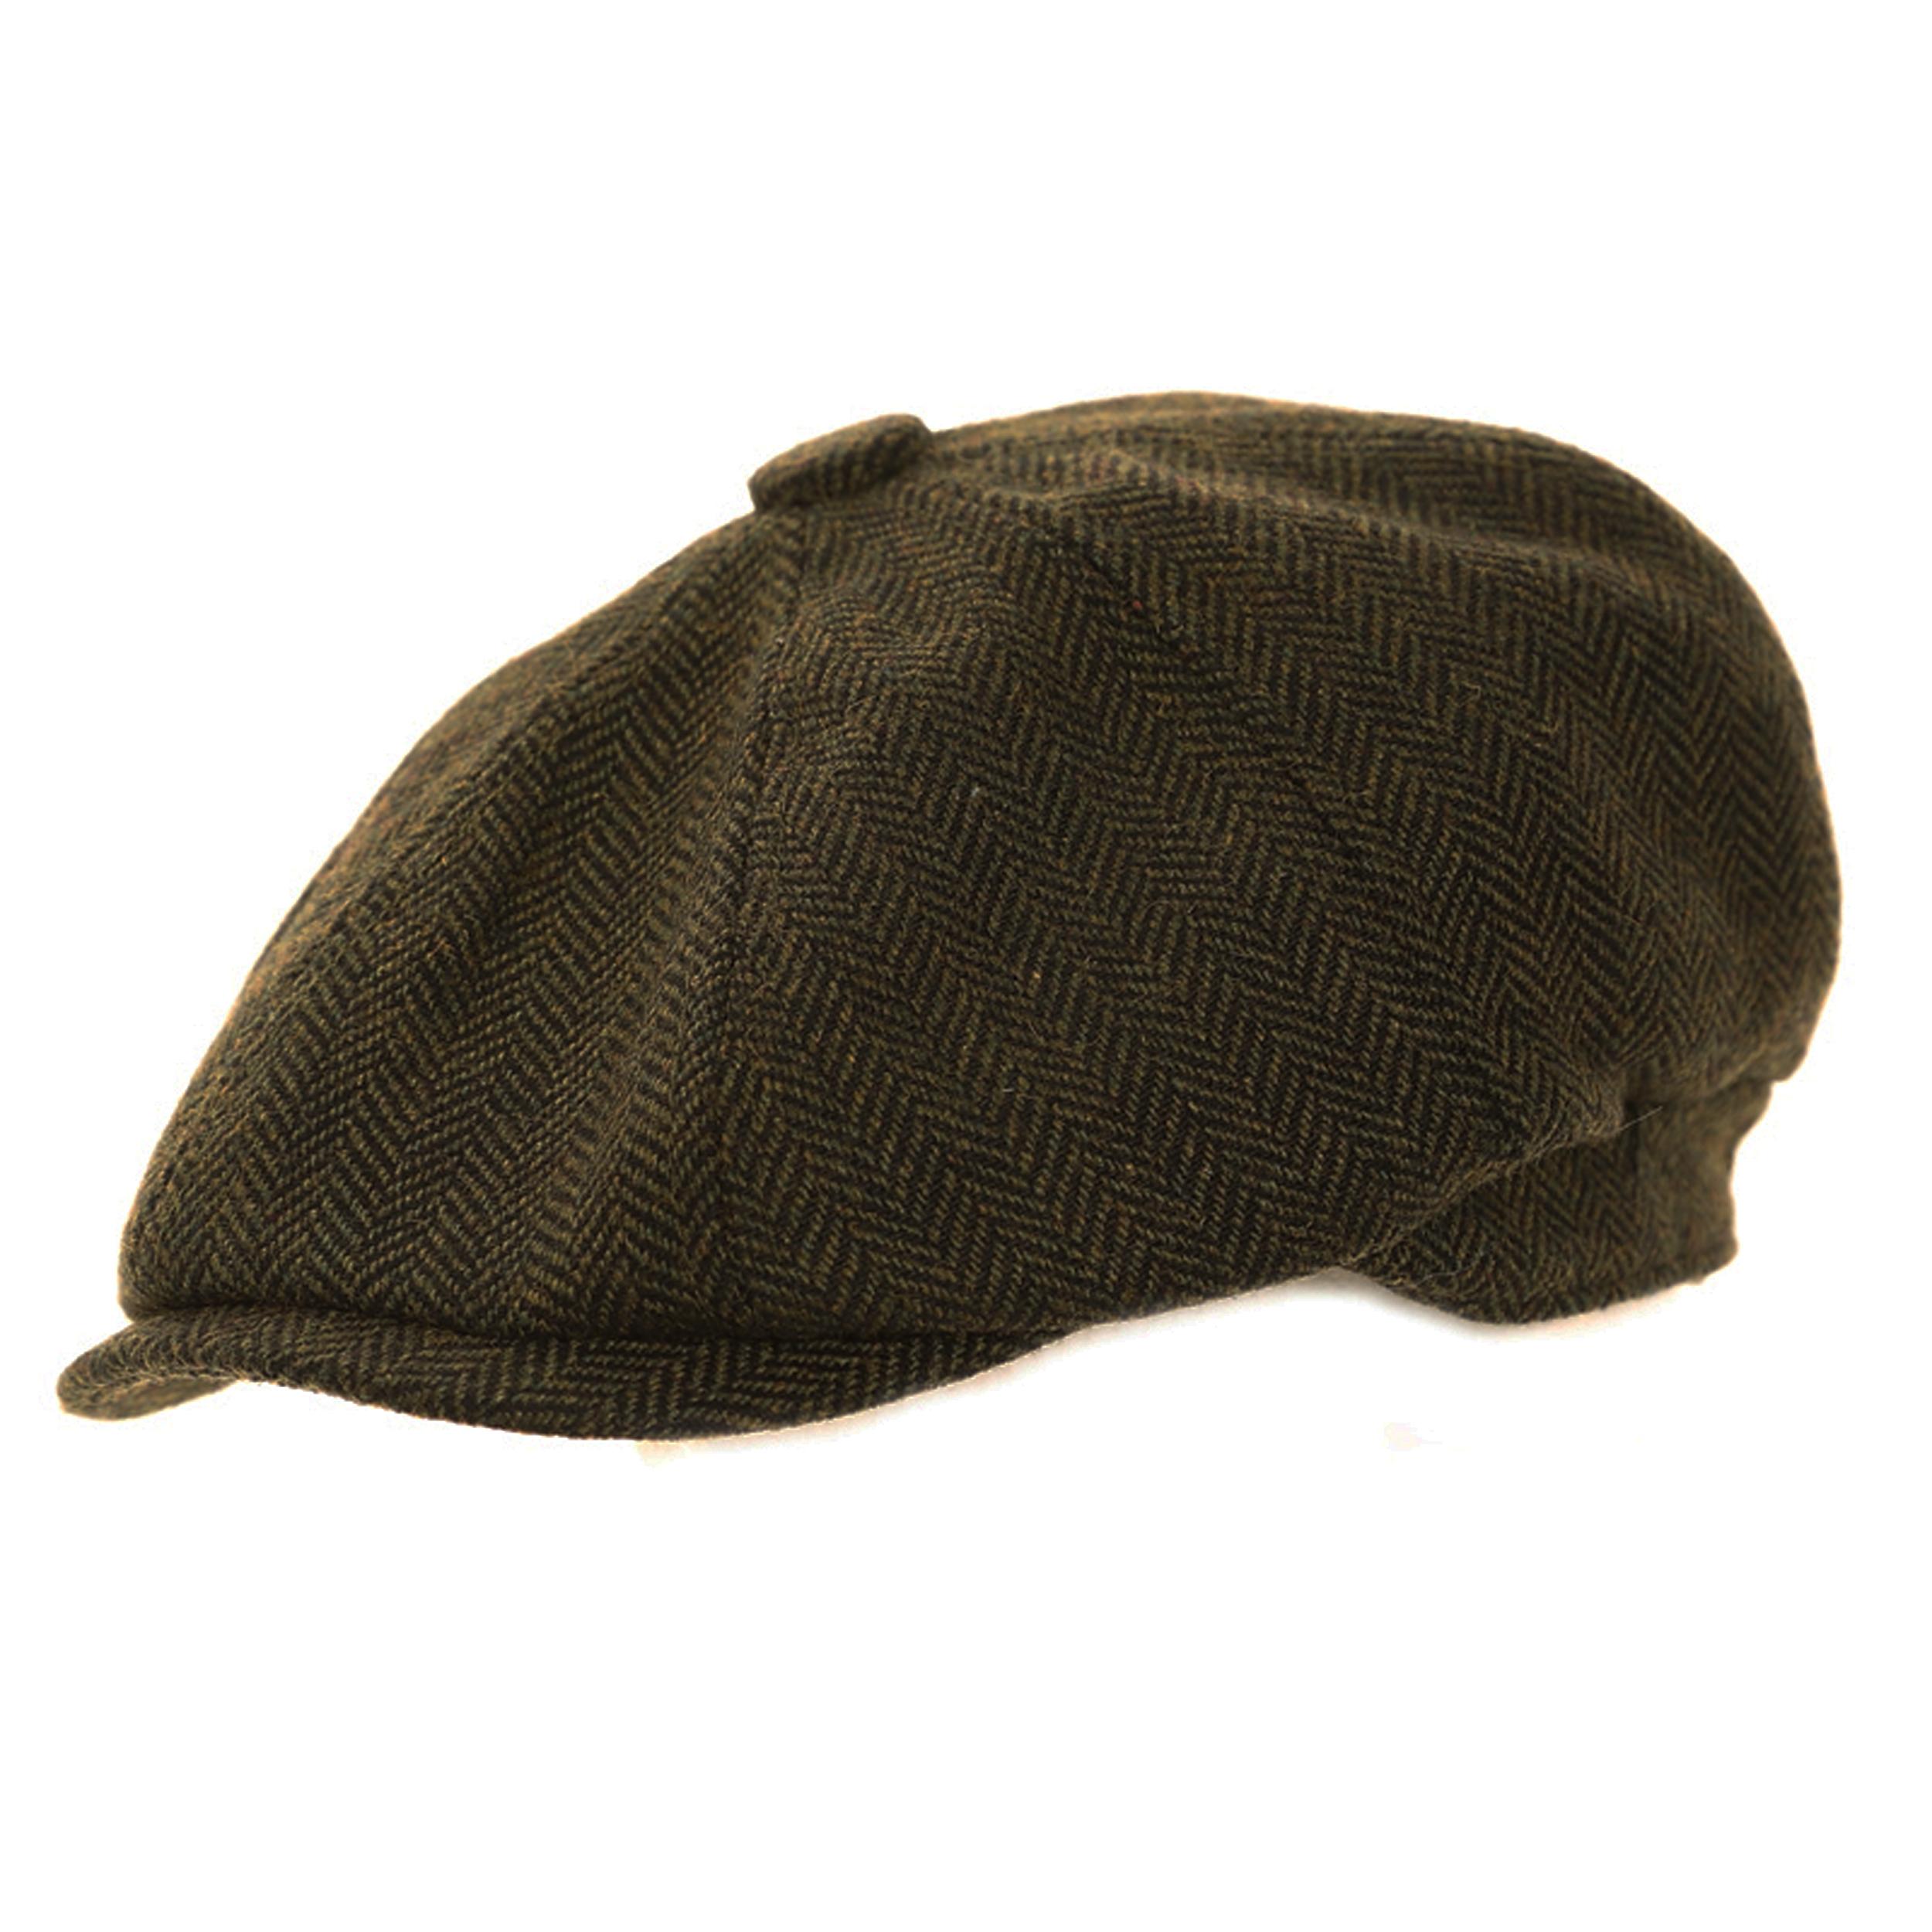 238caf014107 Harris Tweed Hats Flat Caps made in the UK , Irish Wool Socks